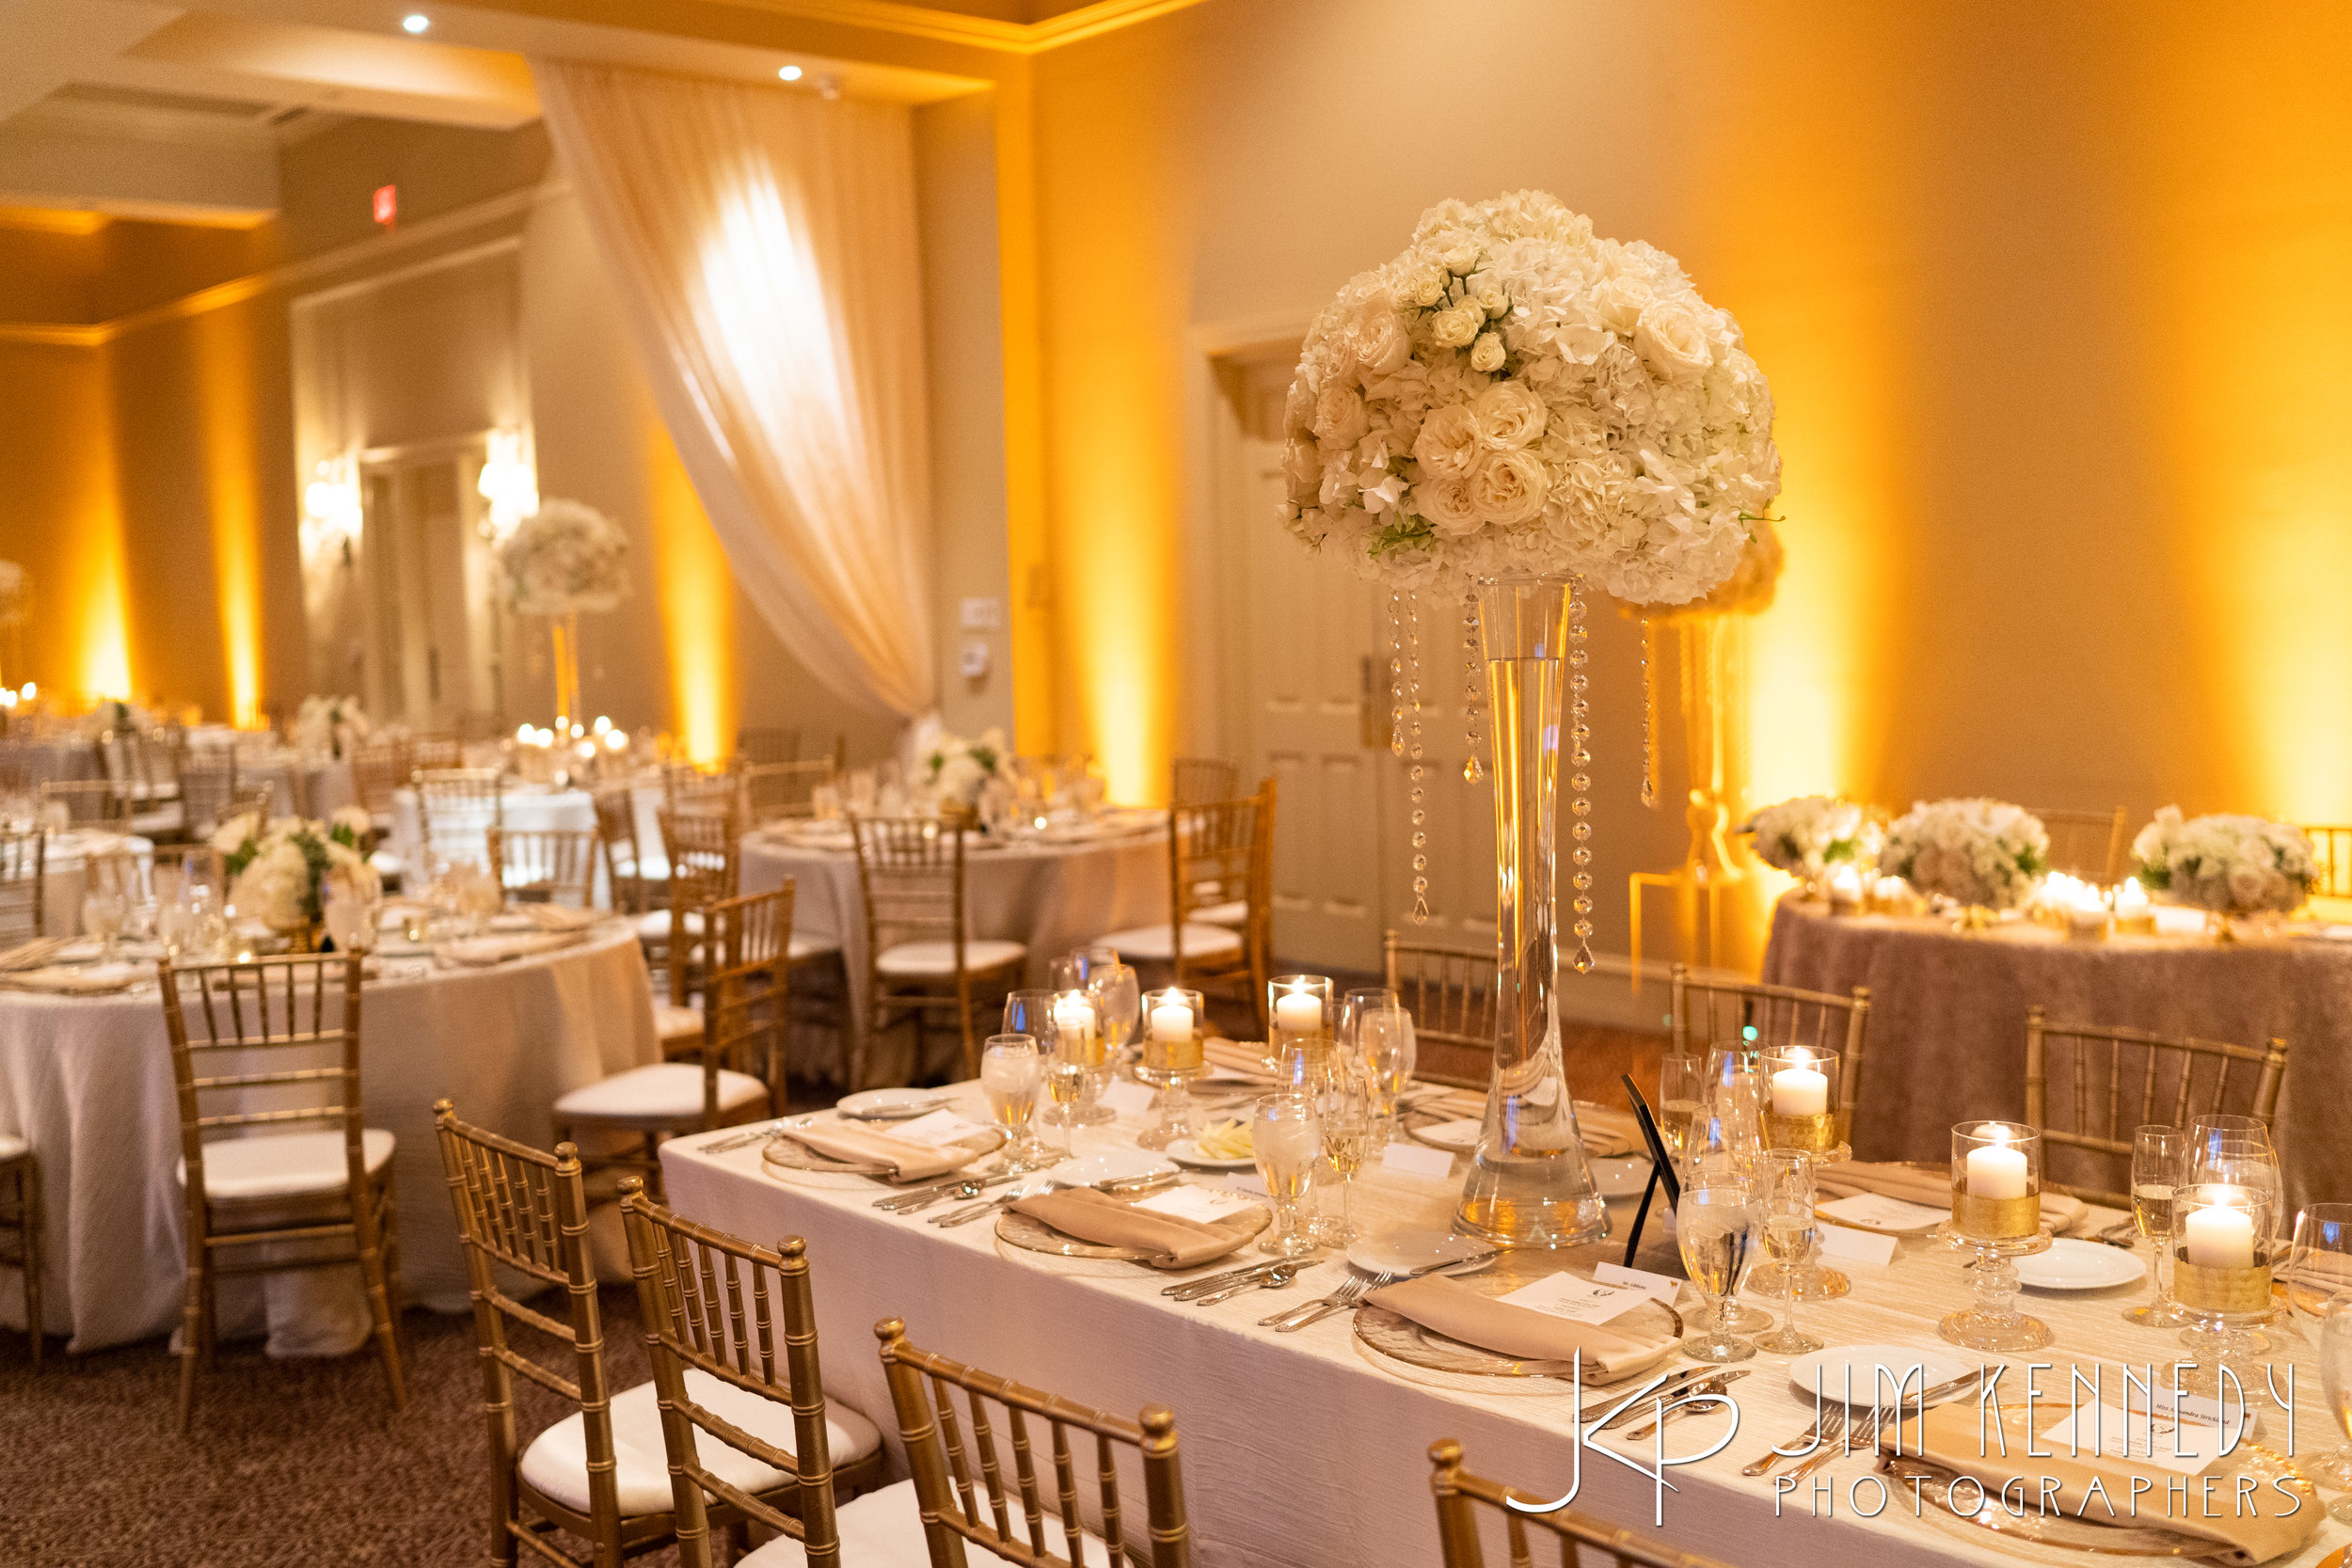 sherwood_country_club_wedding-2873.jpg